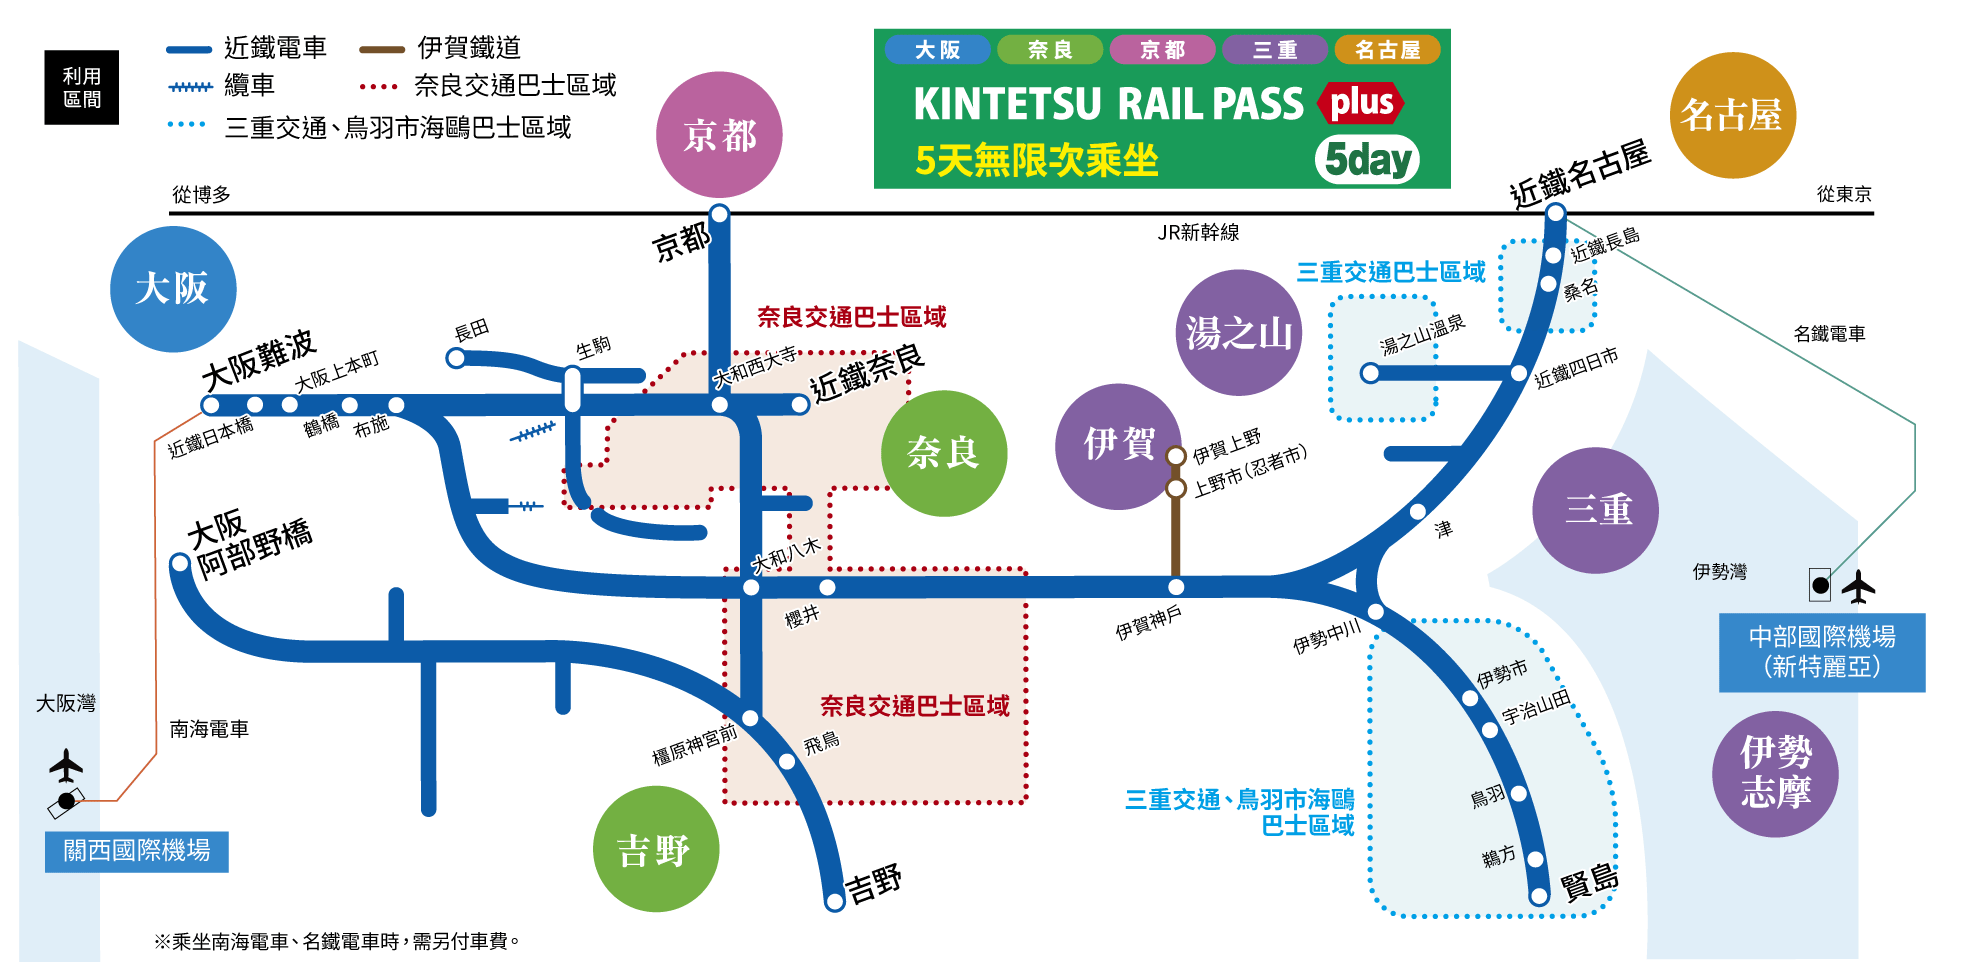 Kintetsu Rail Pass Plus路線圖